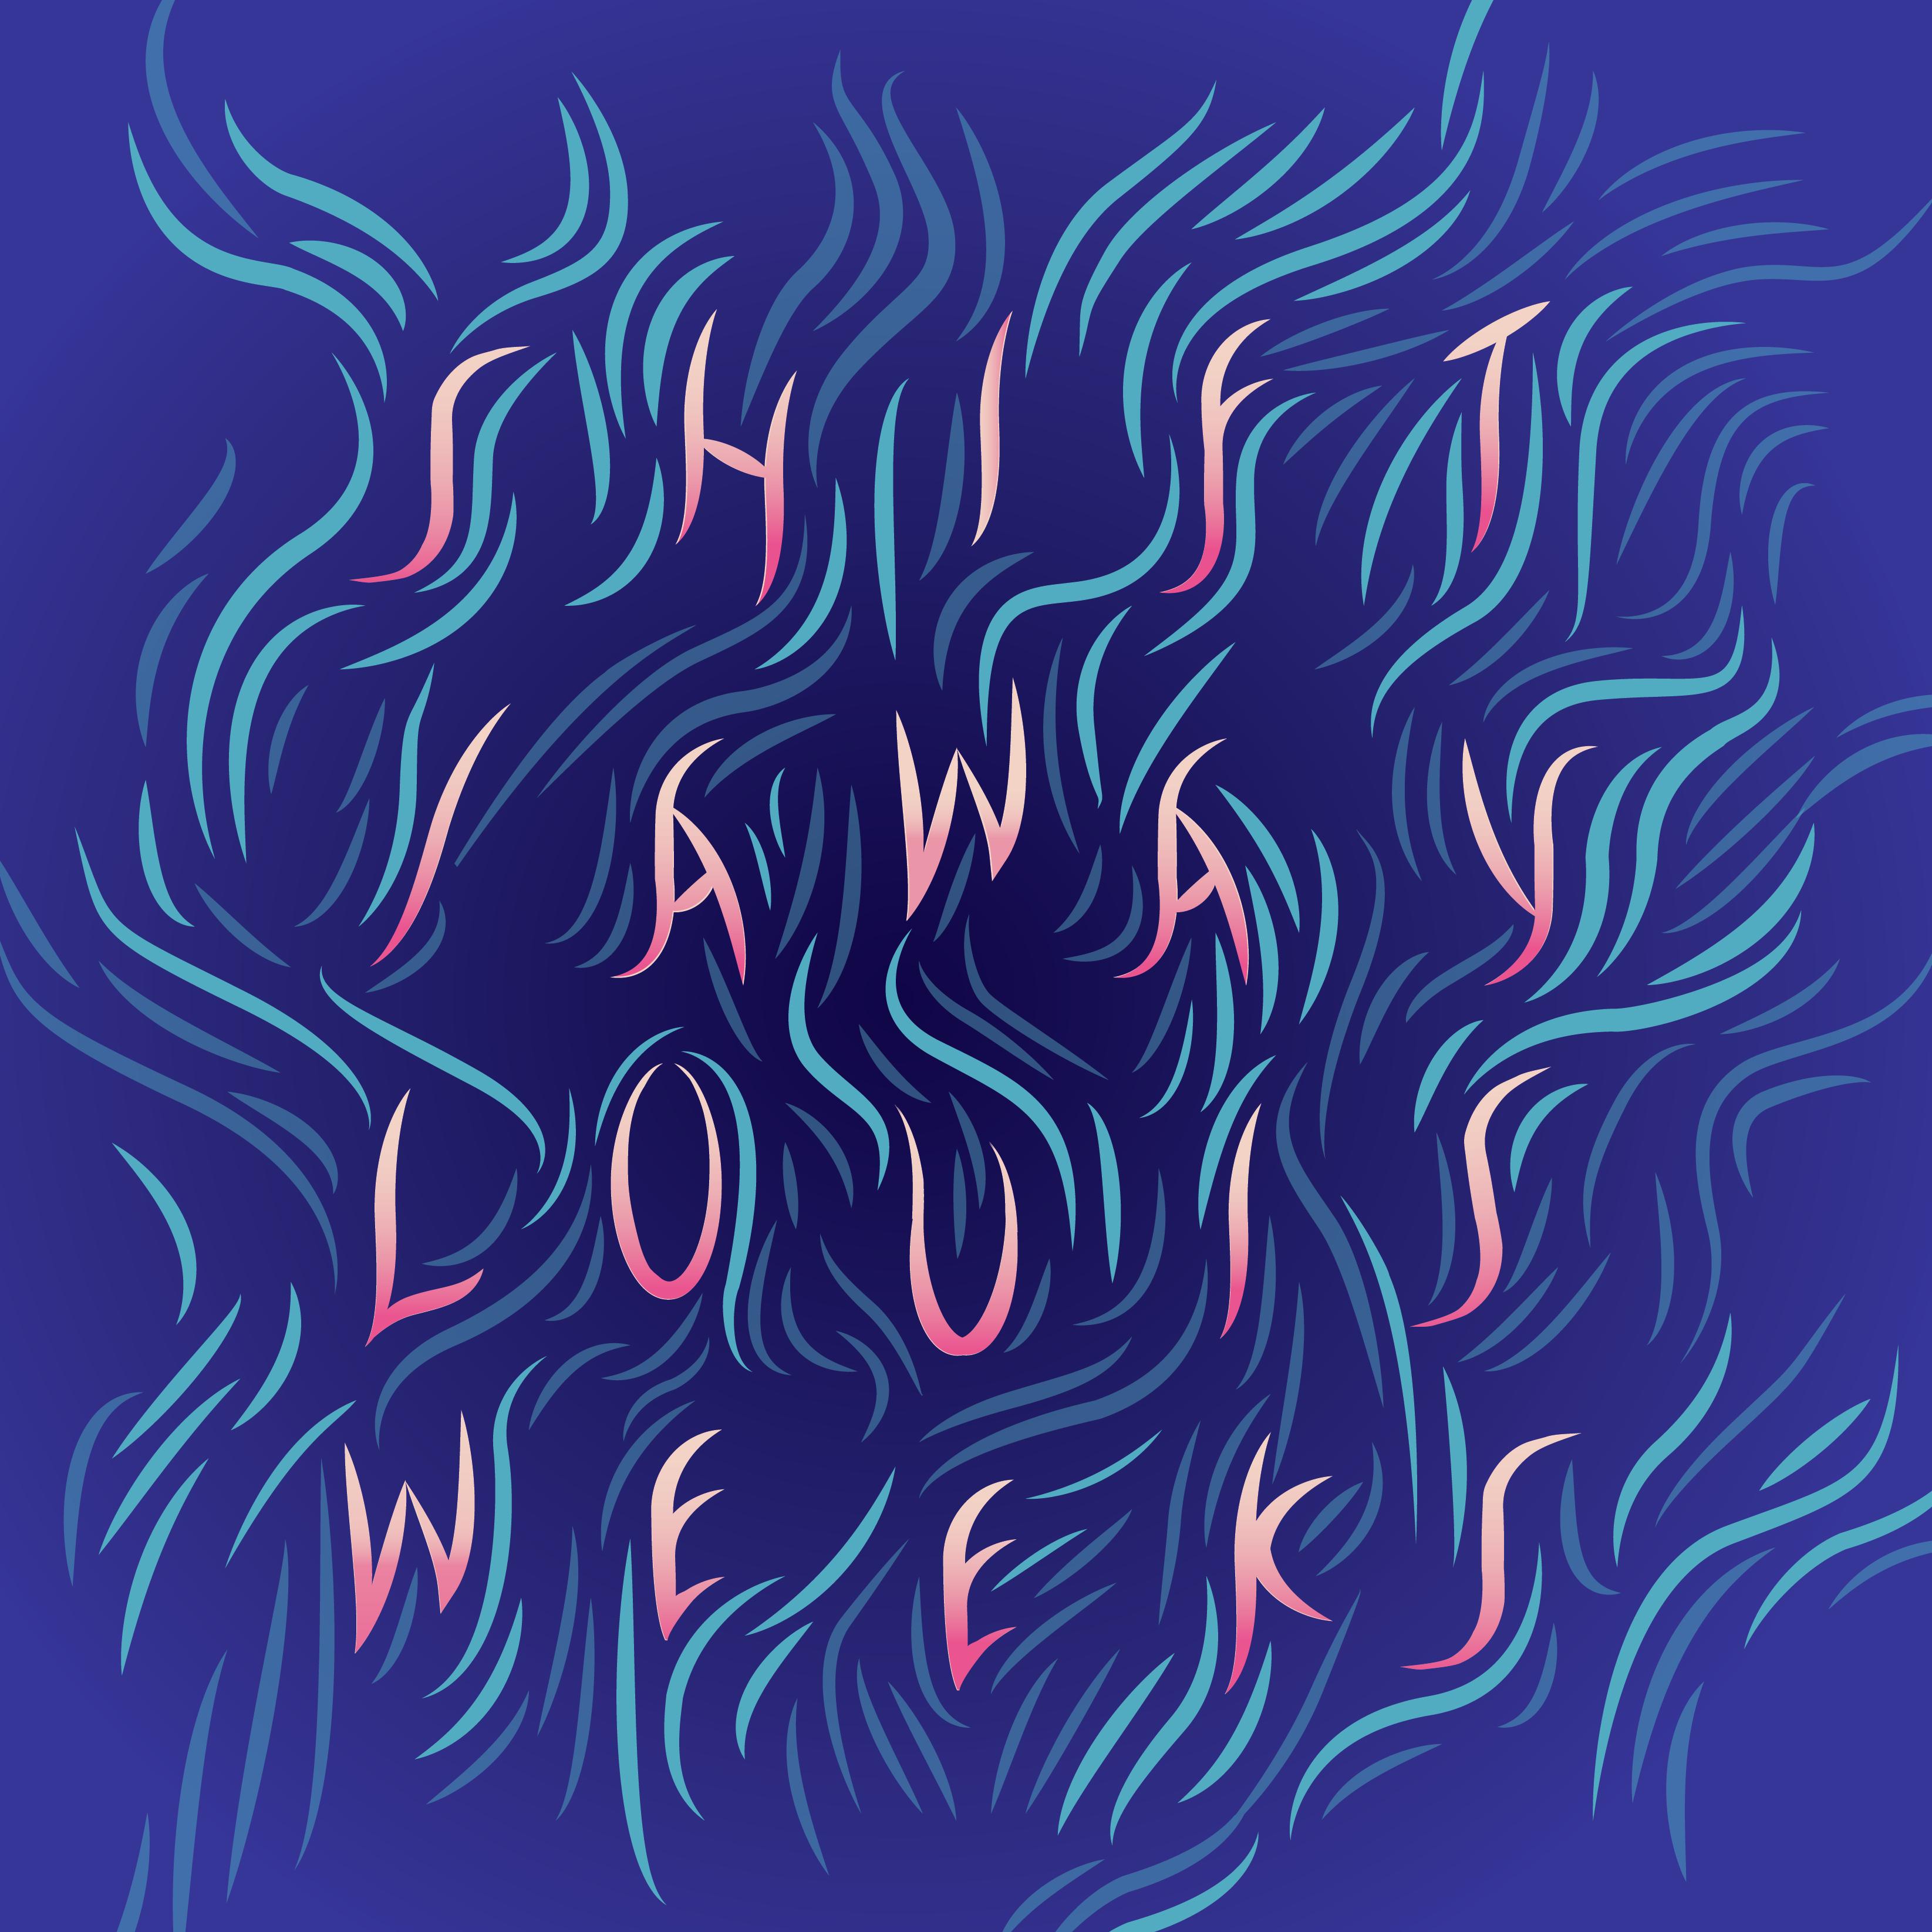 shift/away by Louis Weeks.